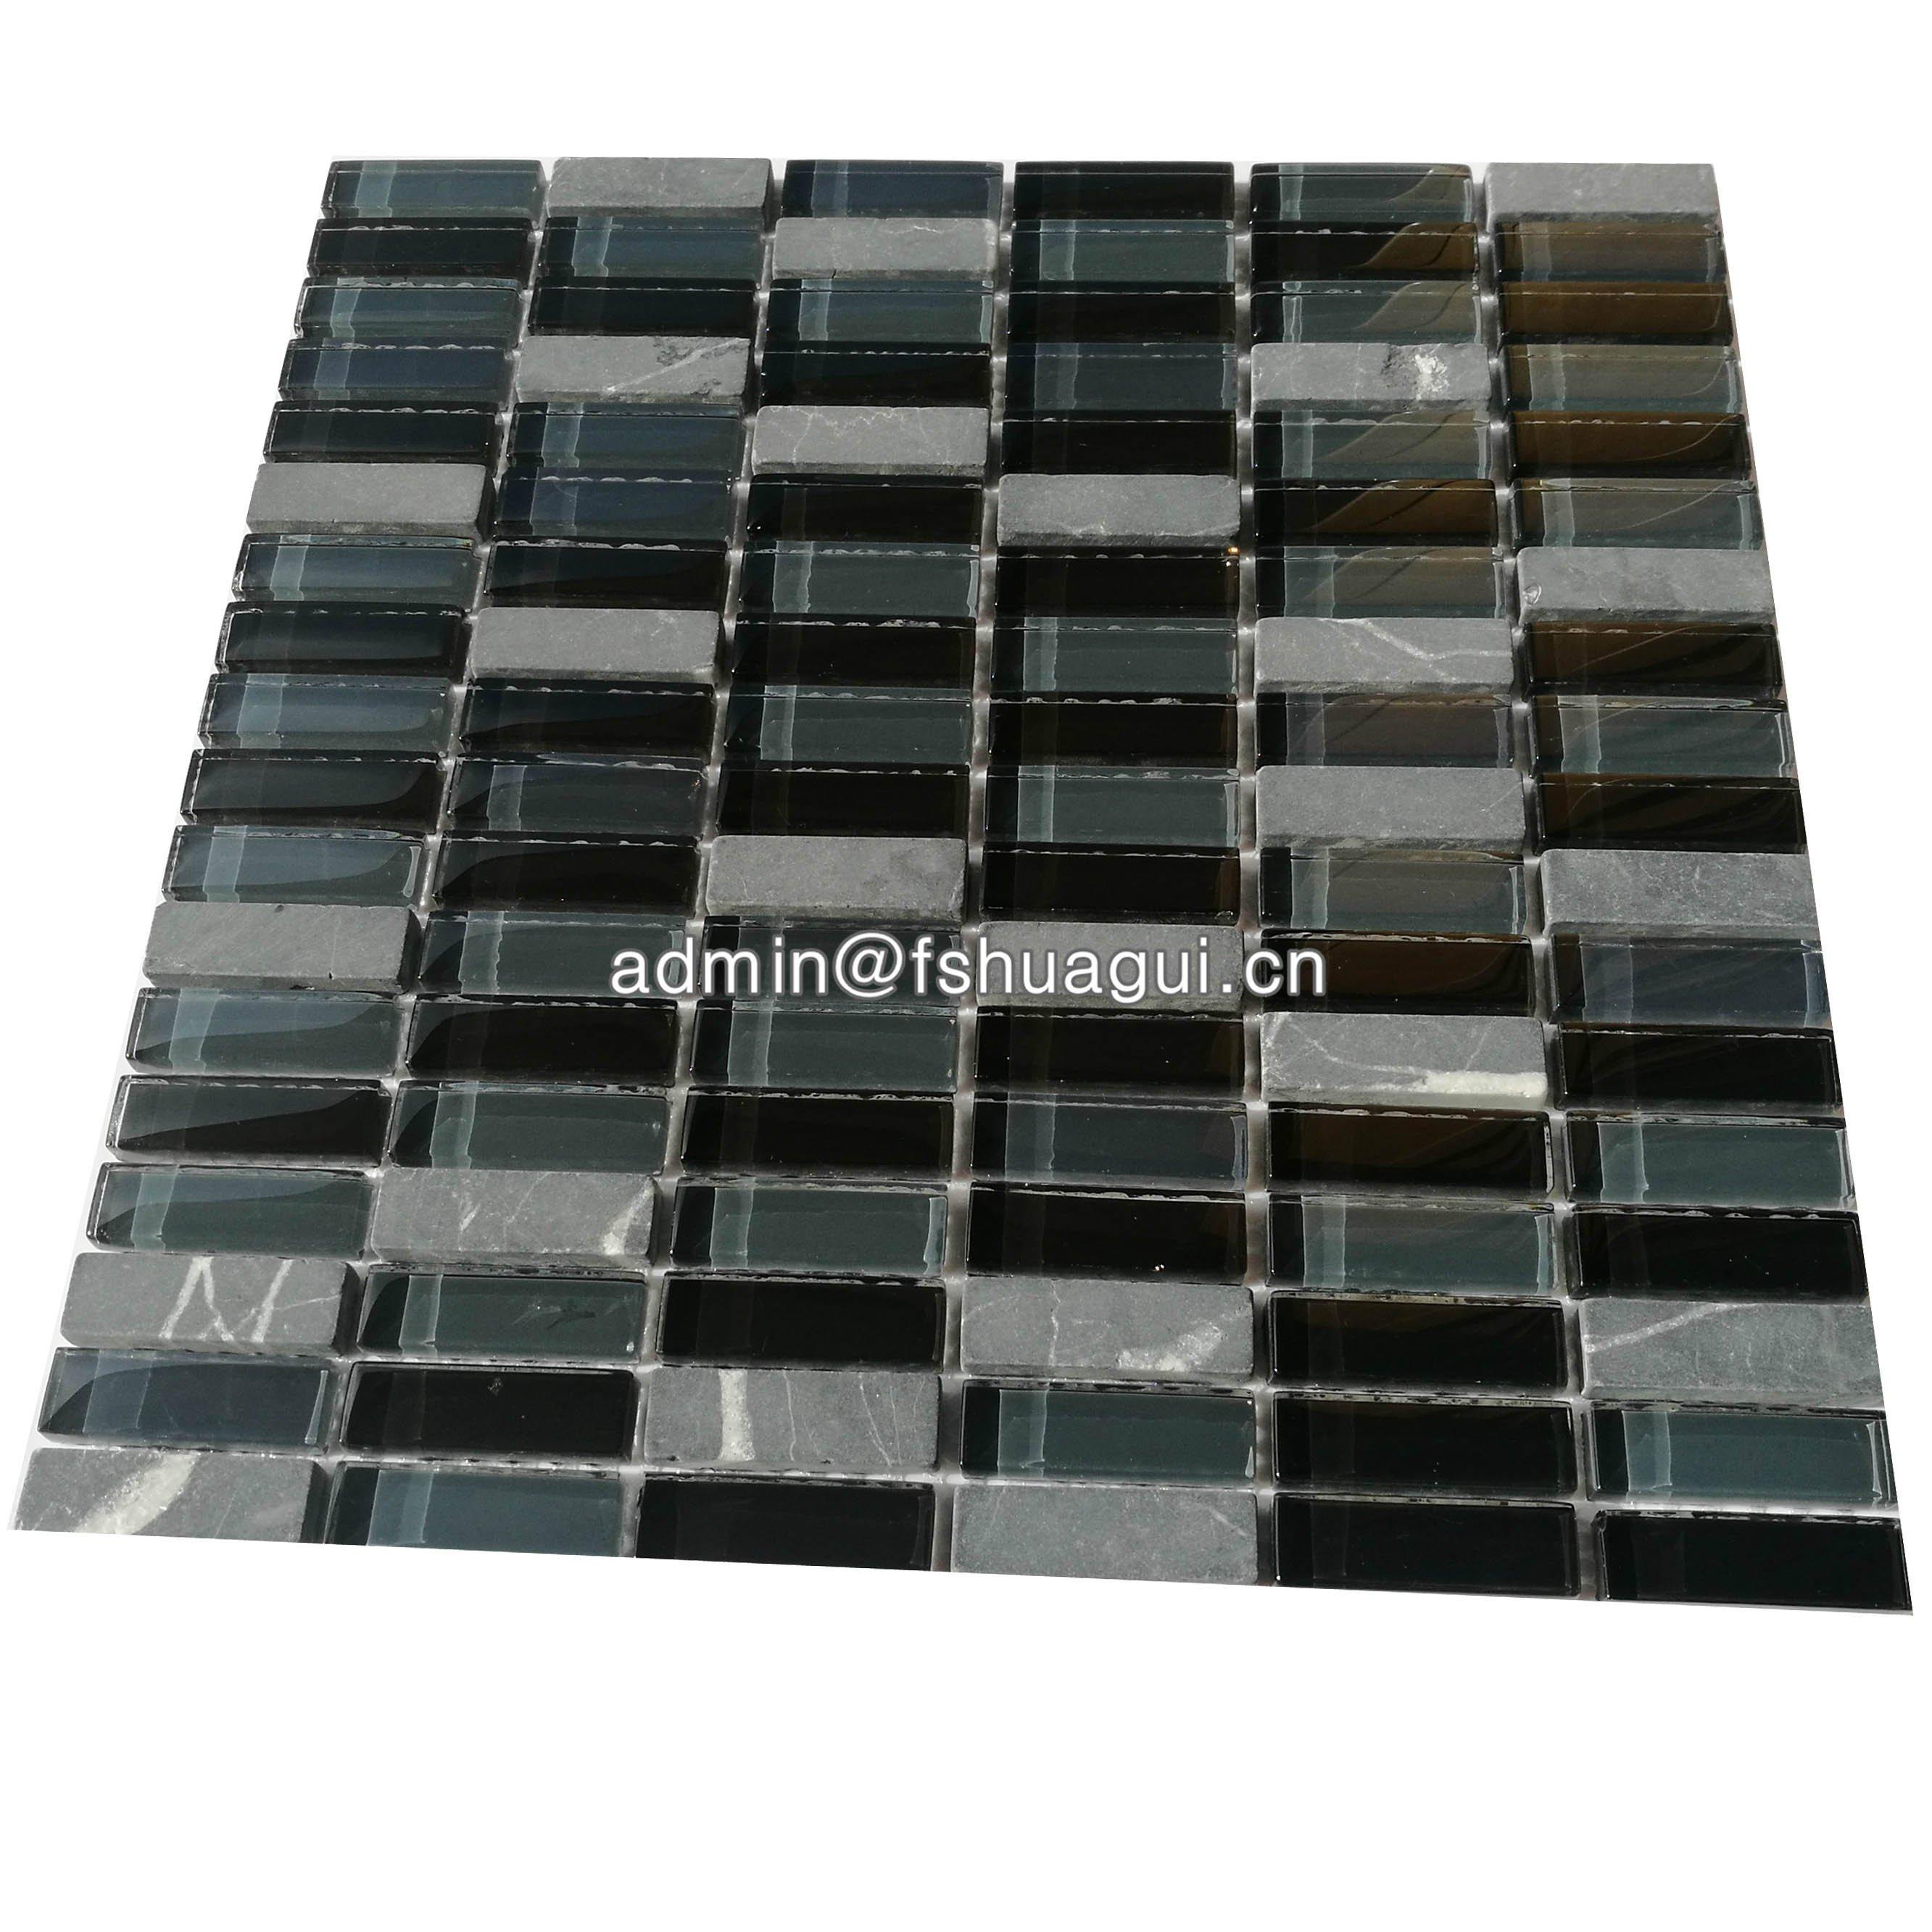 Huagui Glass mosaic HG-ES001 GLASS MOSAIC TILE image68